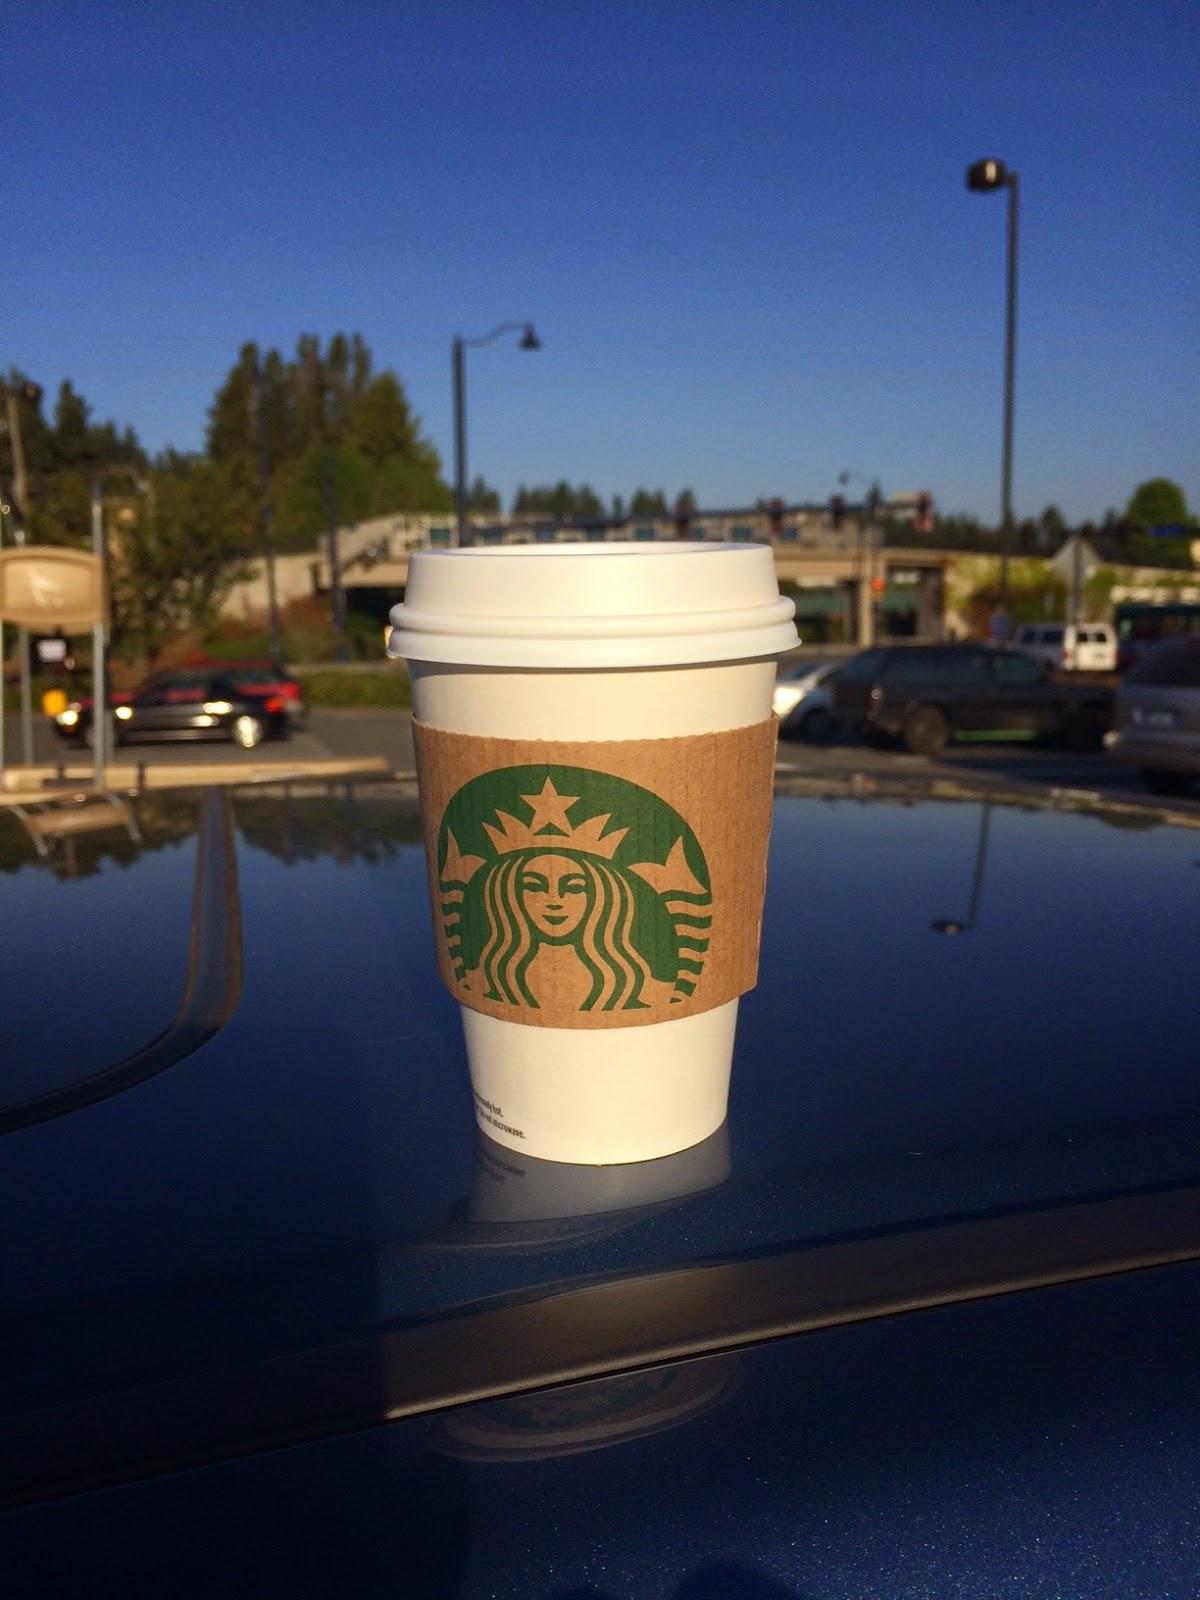 Starbucks Pumpkin Spice Latte Sales Promotion